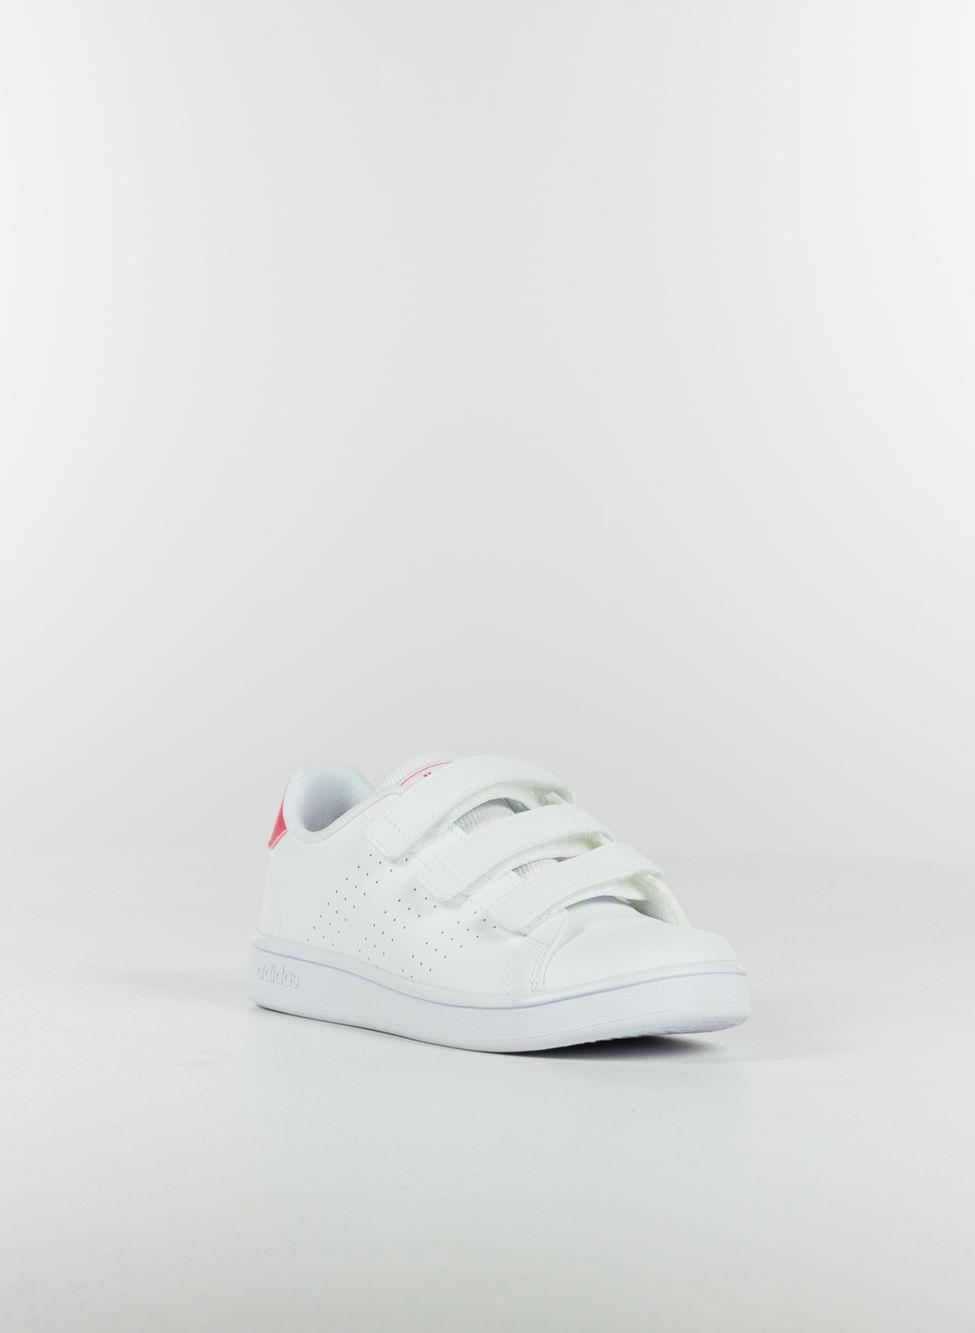 SCARPA_ADVANTAGE_BAMBINA_adidas